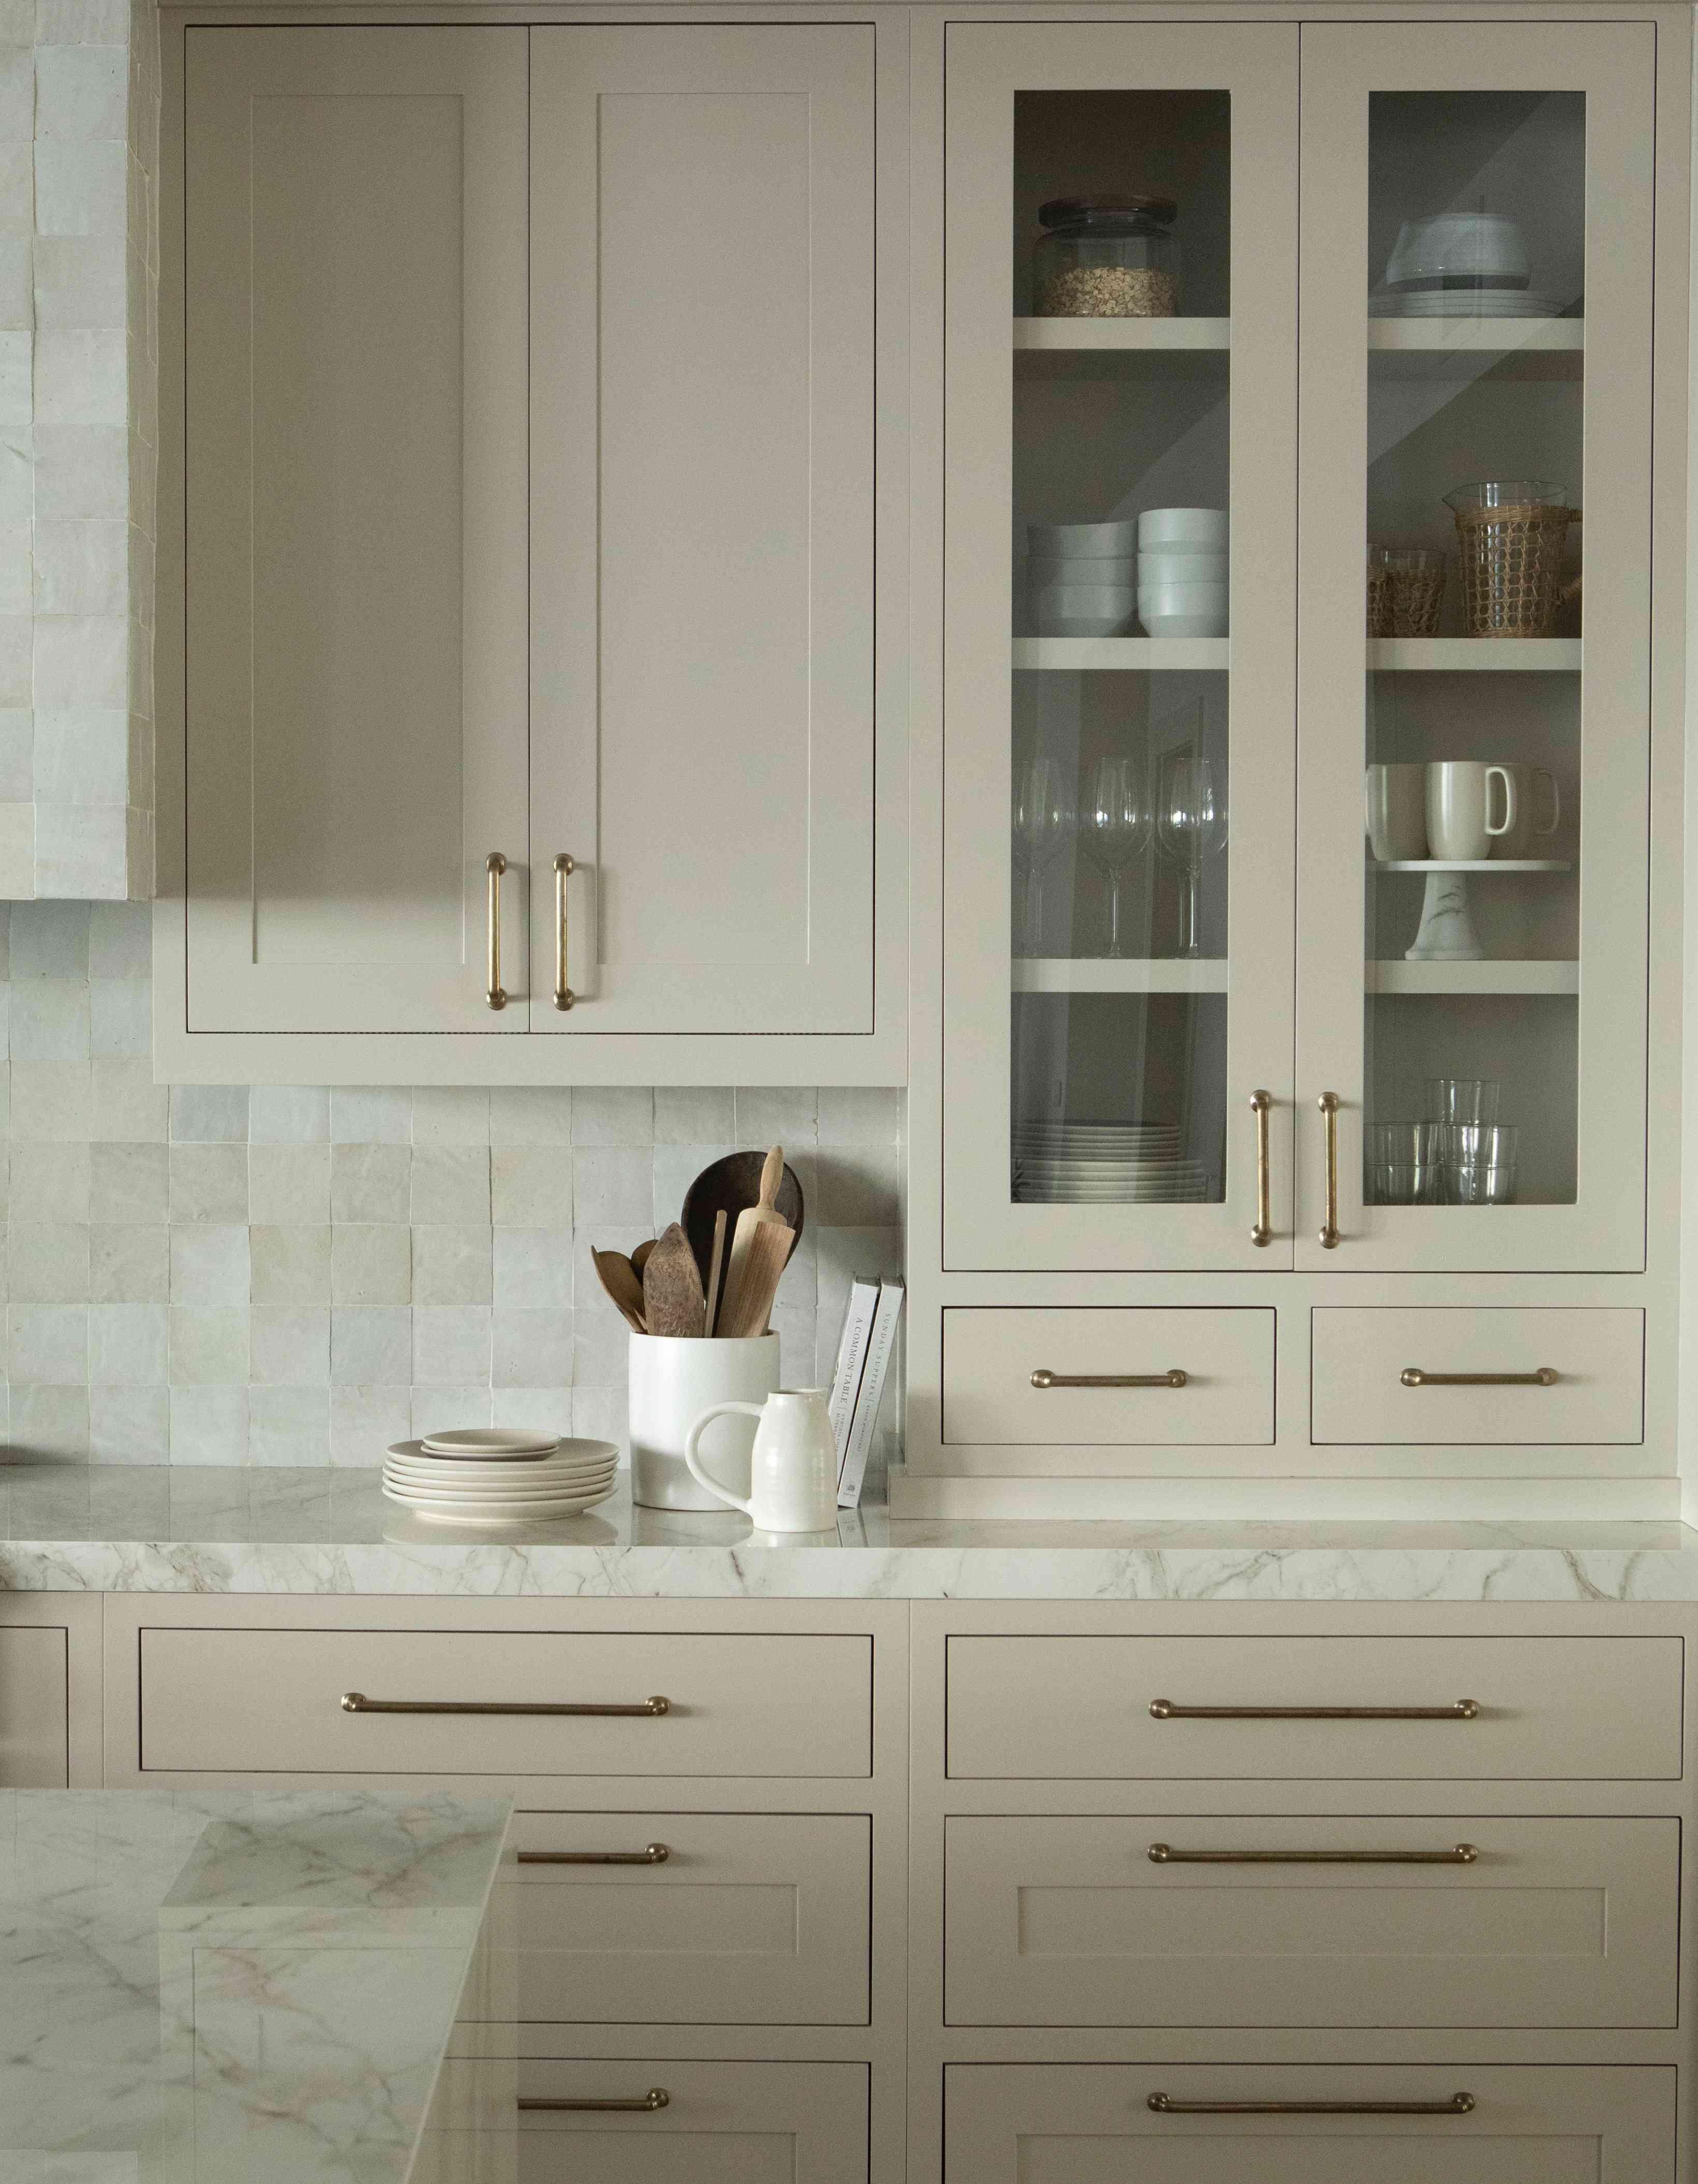 Beige kitchen cabinets with gold hardware.